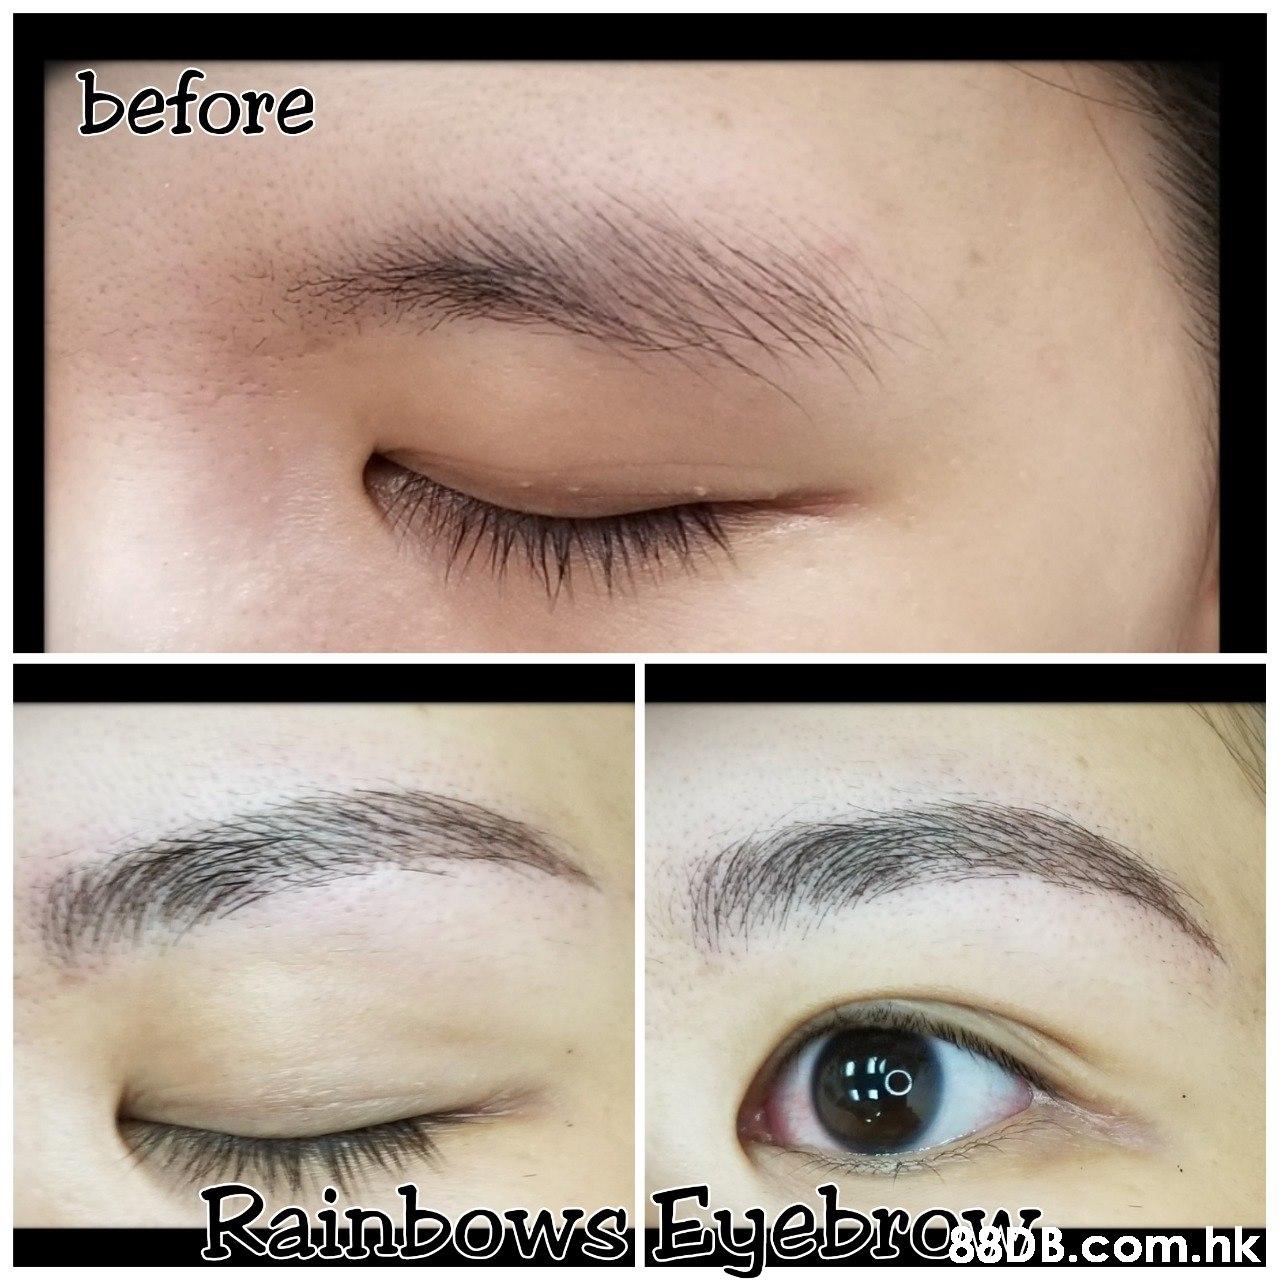 before CoB.com.hk  Eyebrow,Eyelash,Face,Skin,Eye